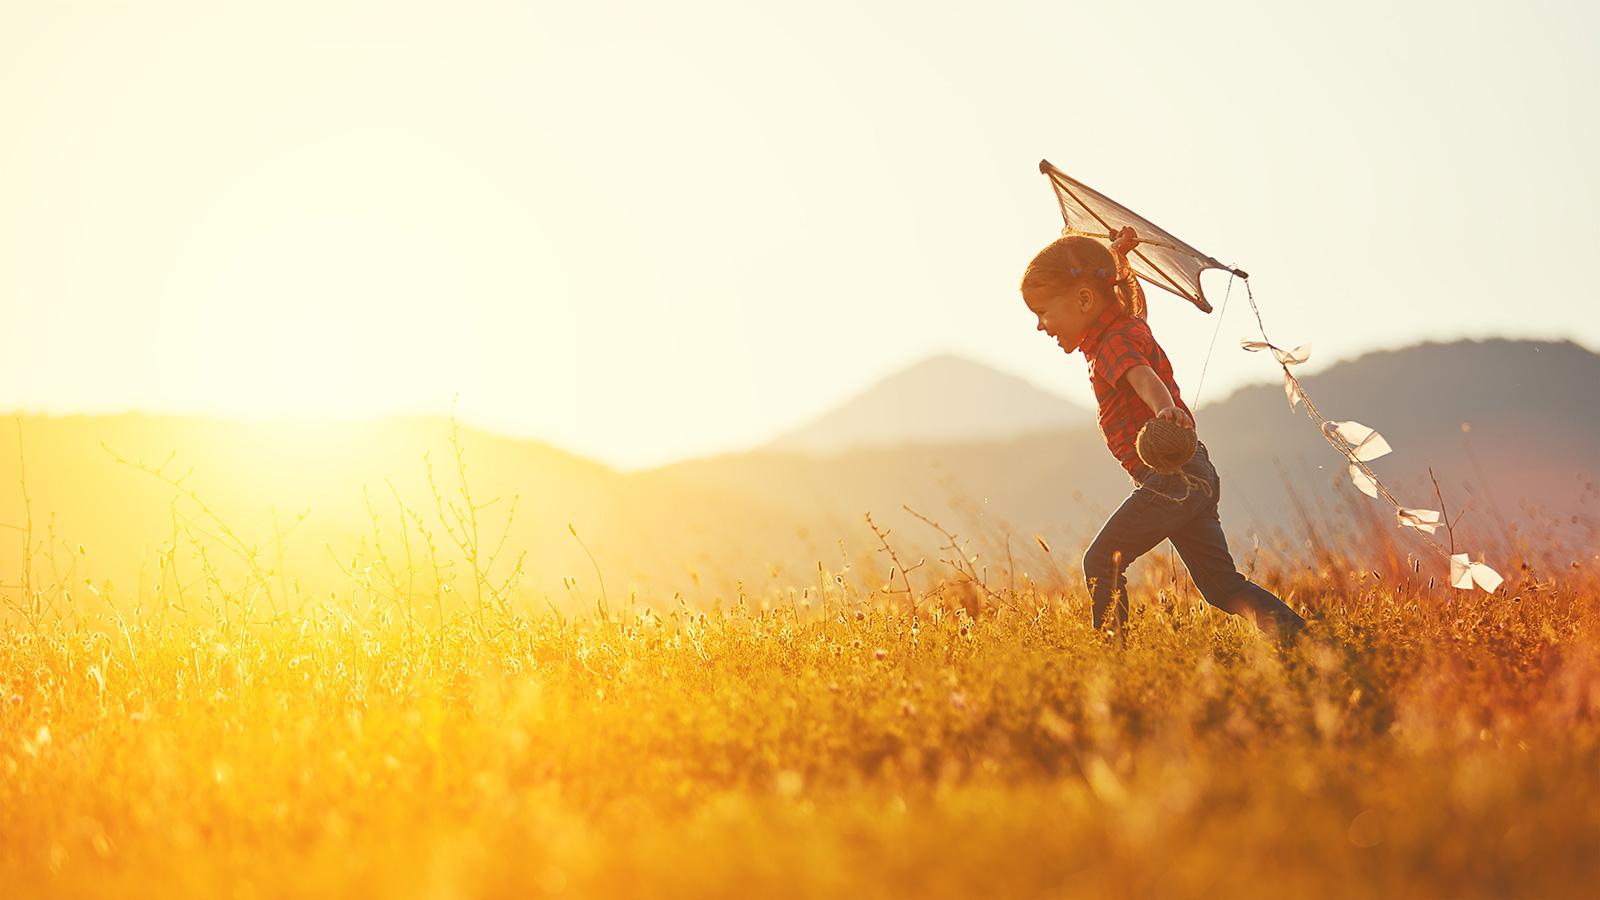 Child with kite